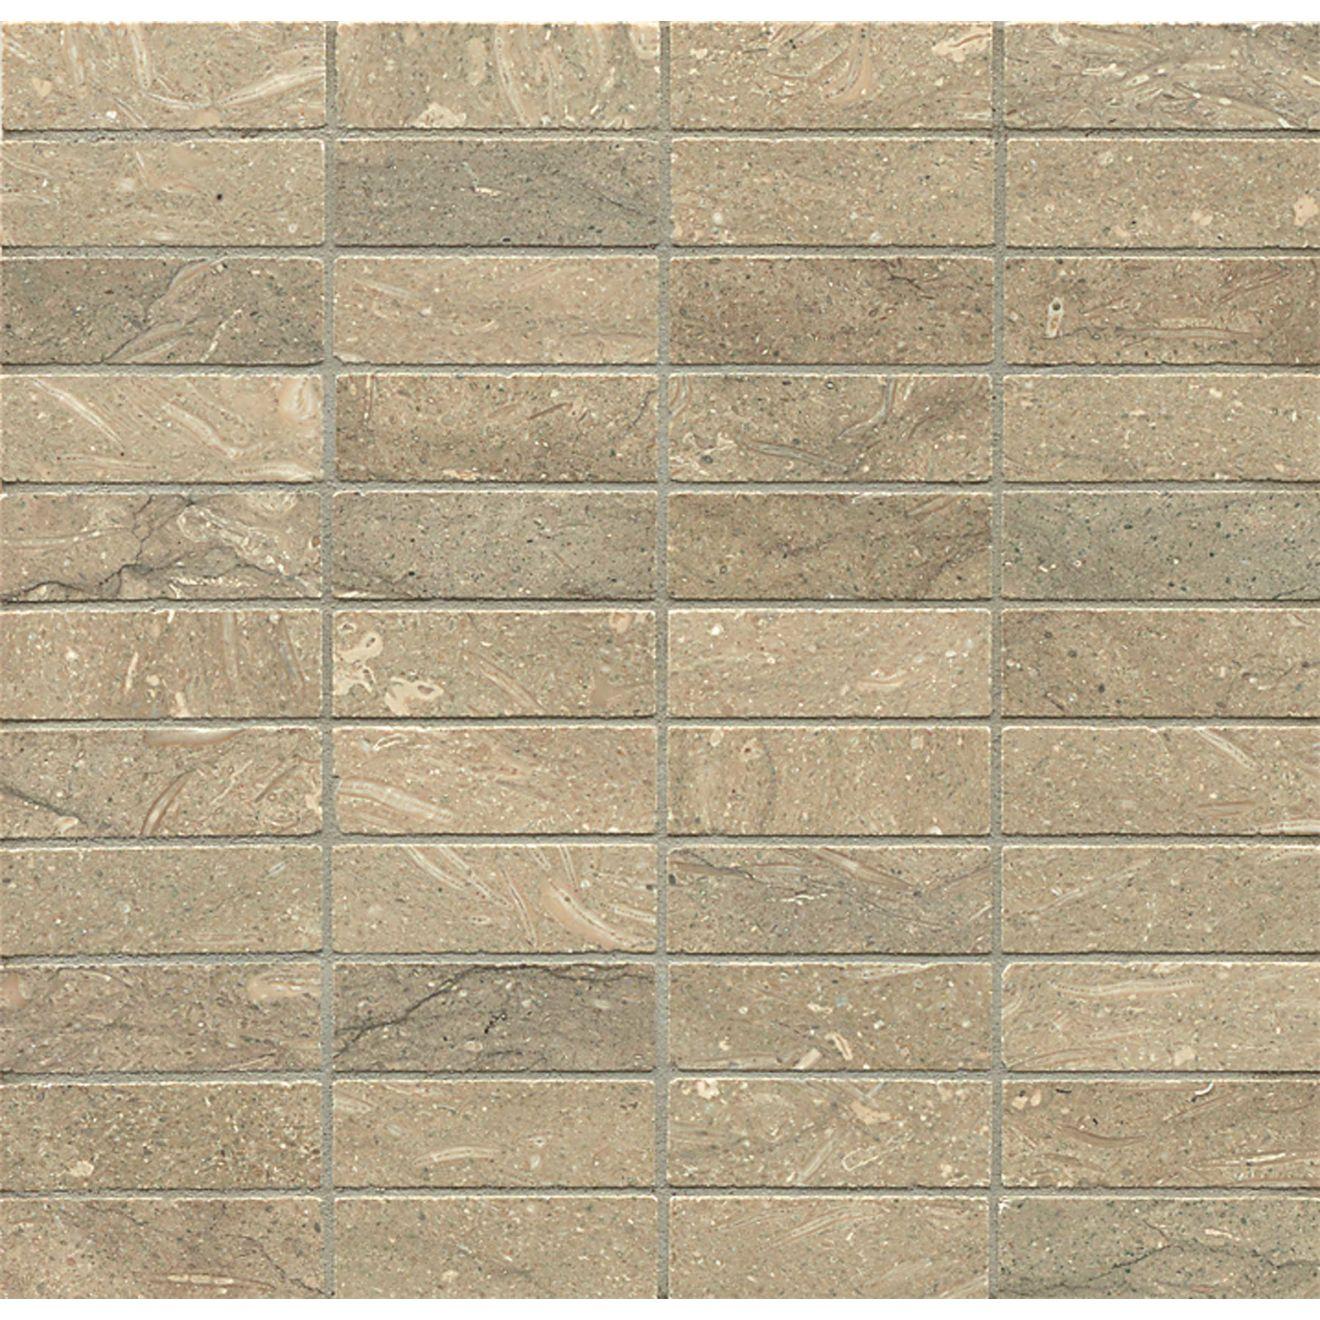 1X3 Mod Rocks Blocks-Tepenade